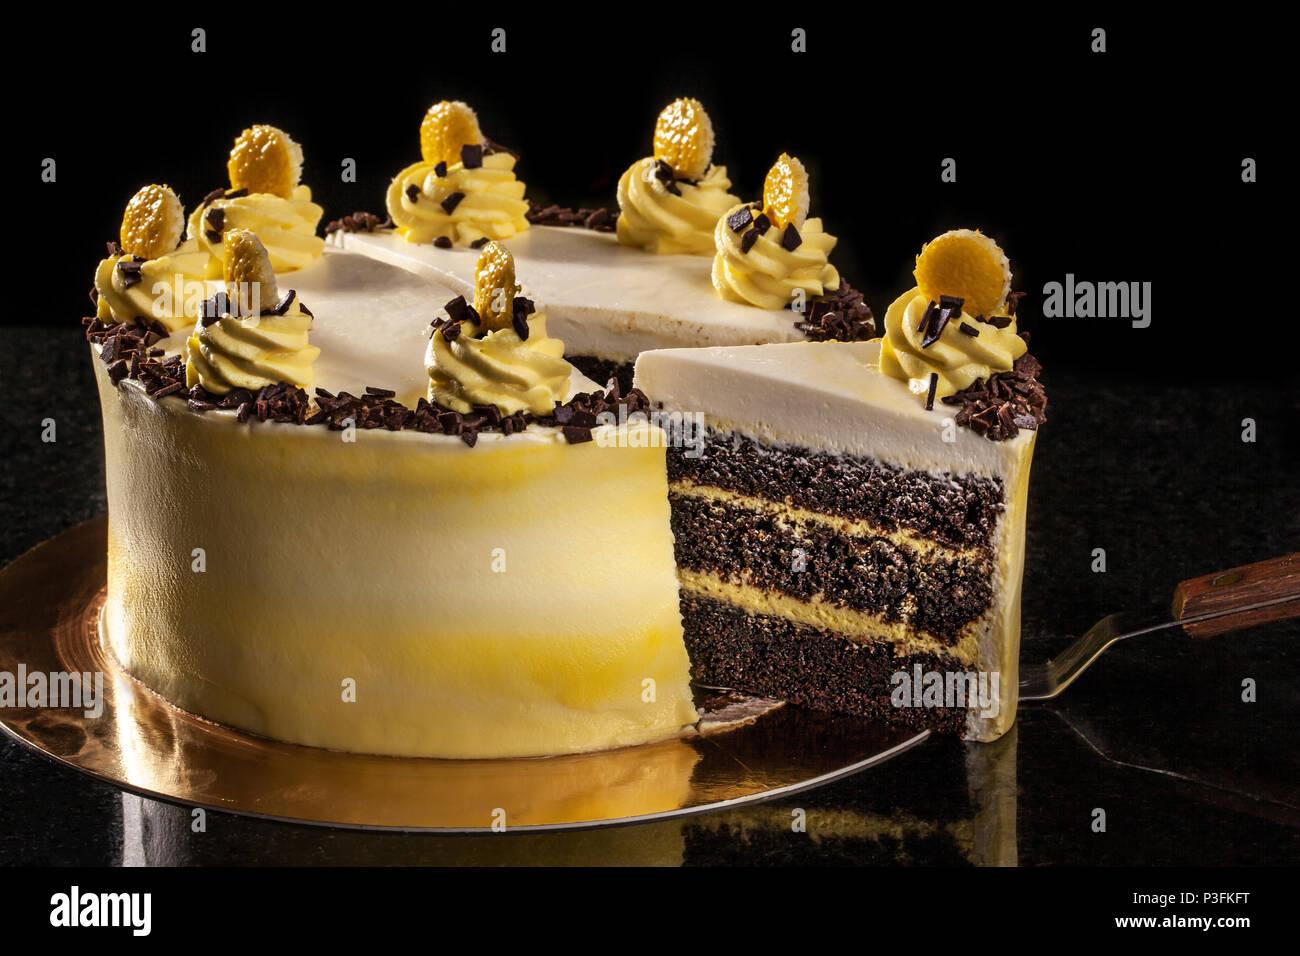 Round Yellow Birthday Cake Decorative Cream Decorations On The Cake